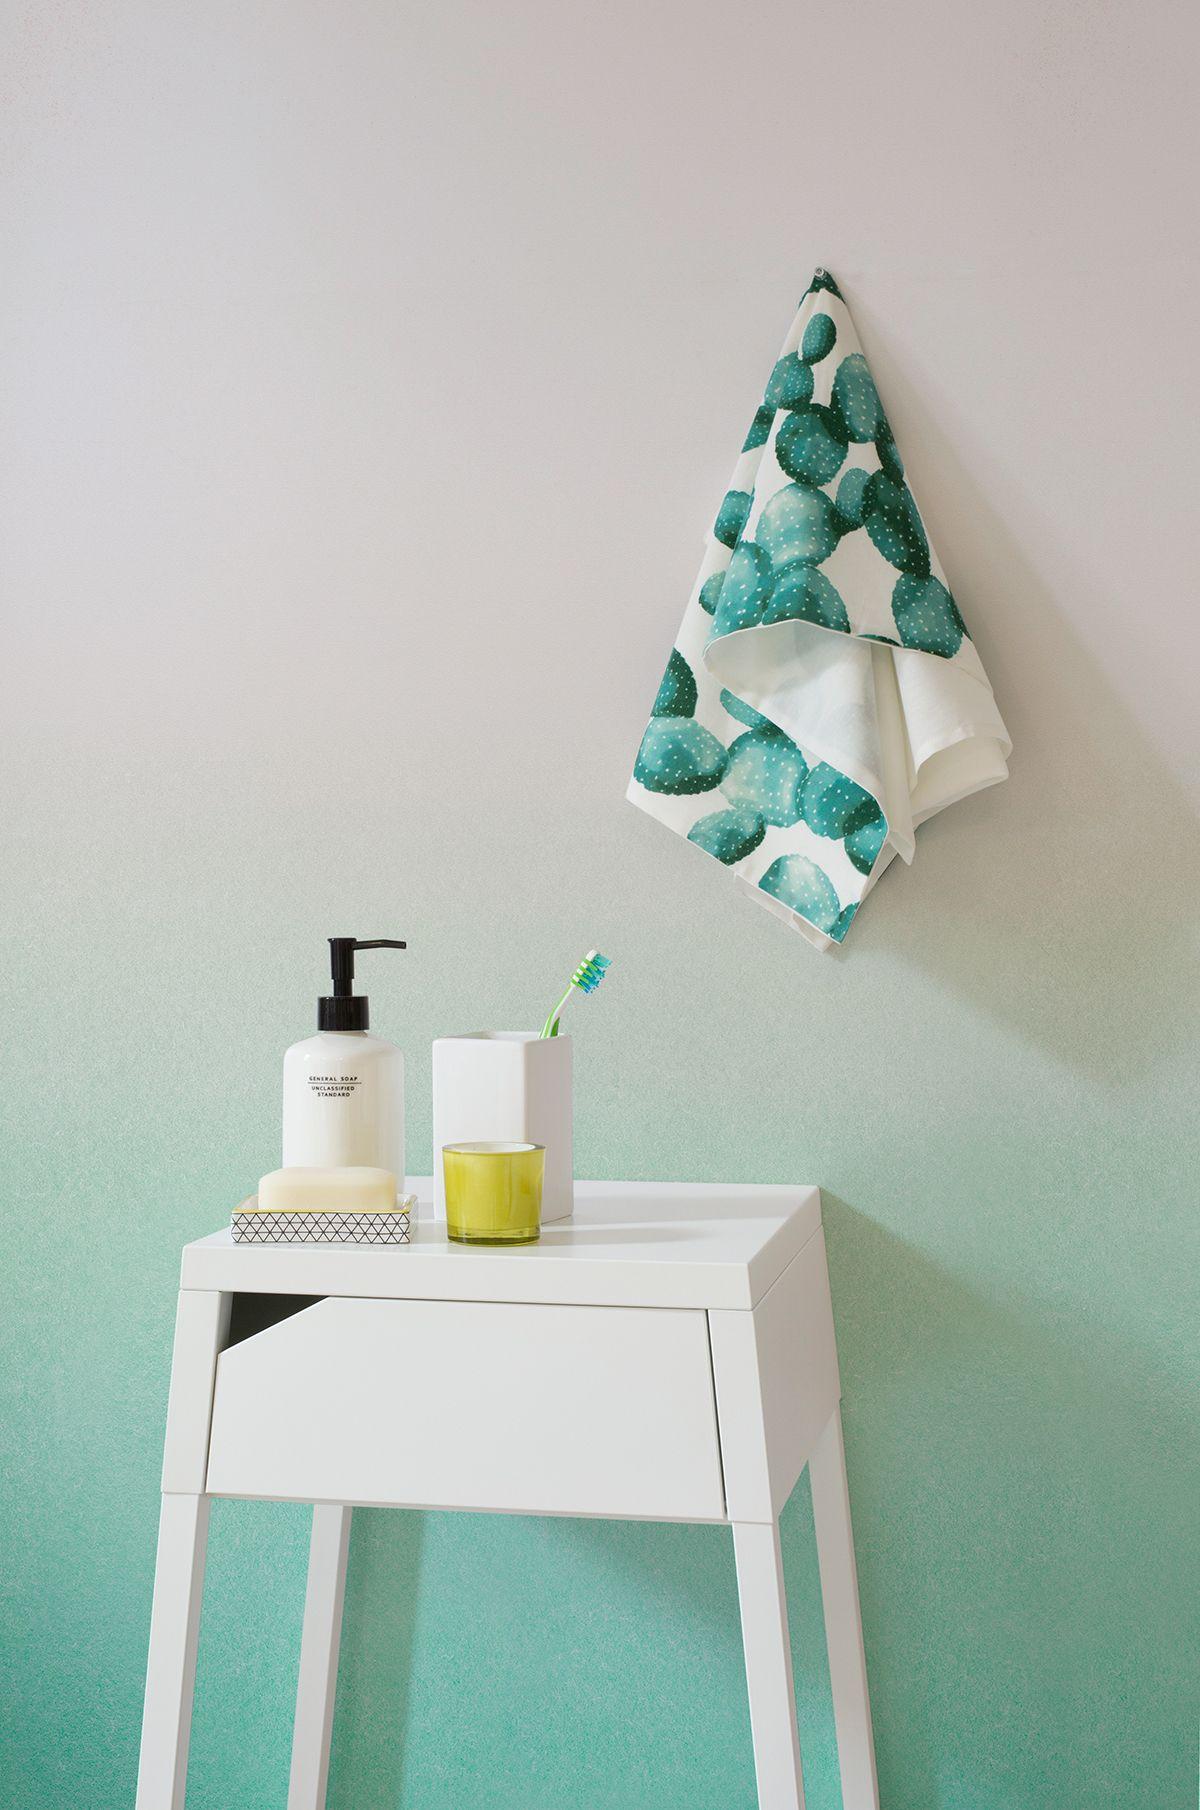 Best Aqua Ombre Wallpaper Muralswallpaper Ombre Wallpapers 400 x 300